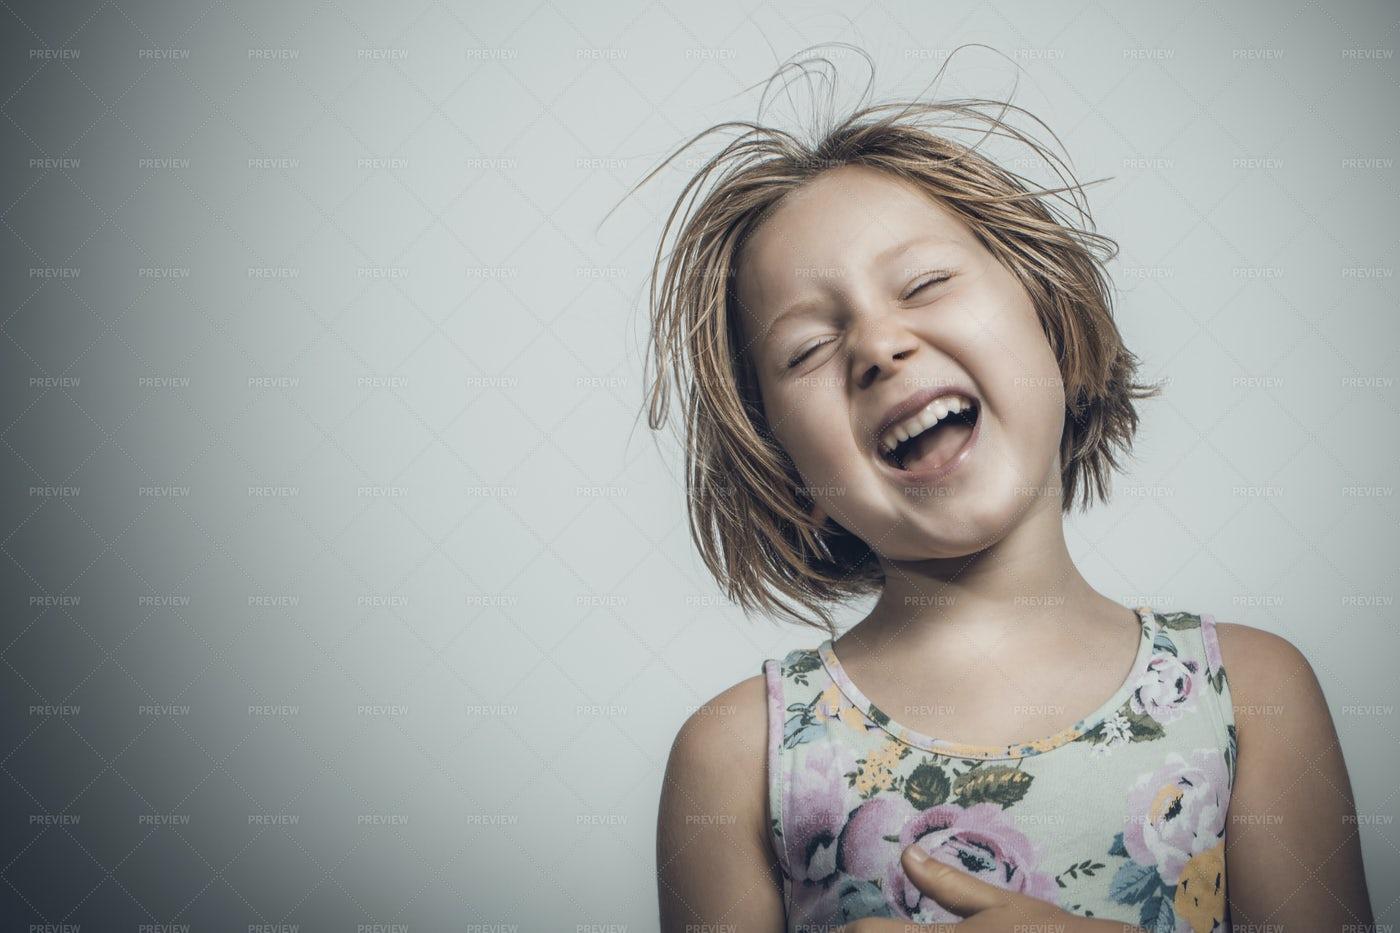 Little Girl With Short Hair: Stock Photos